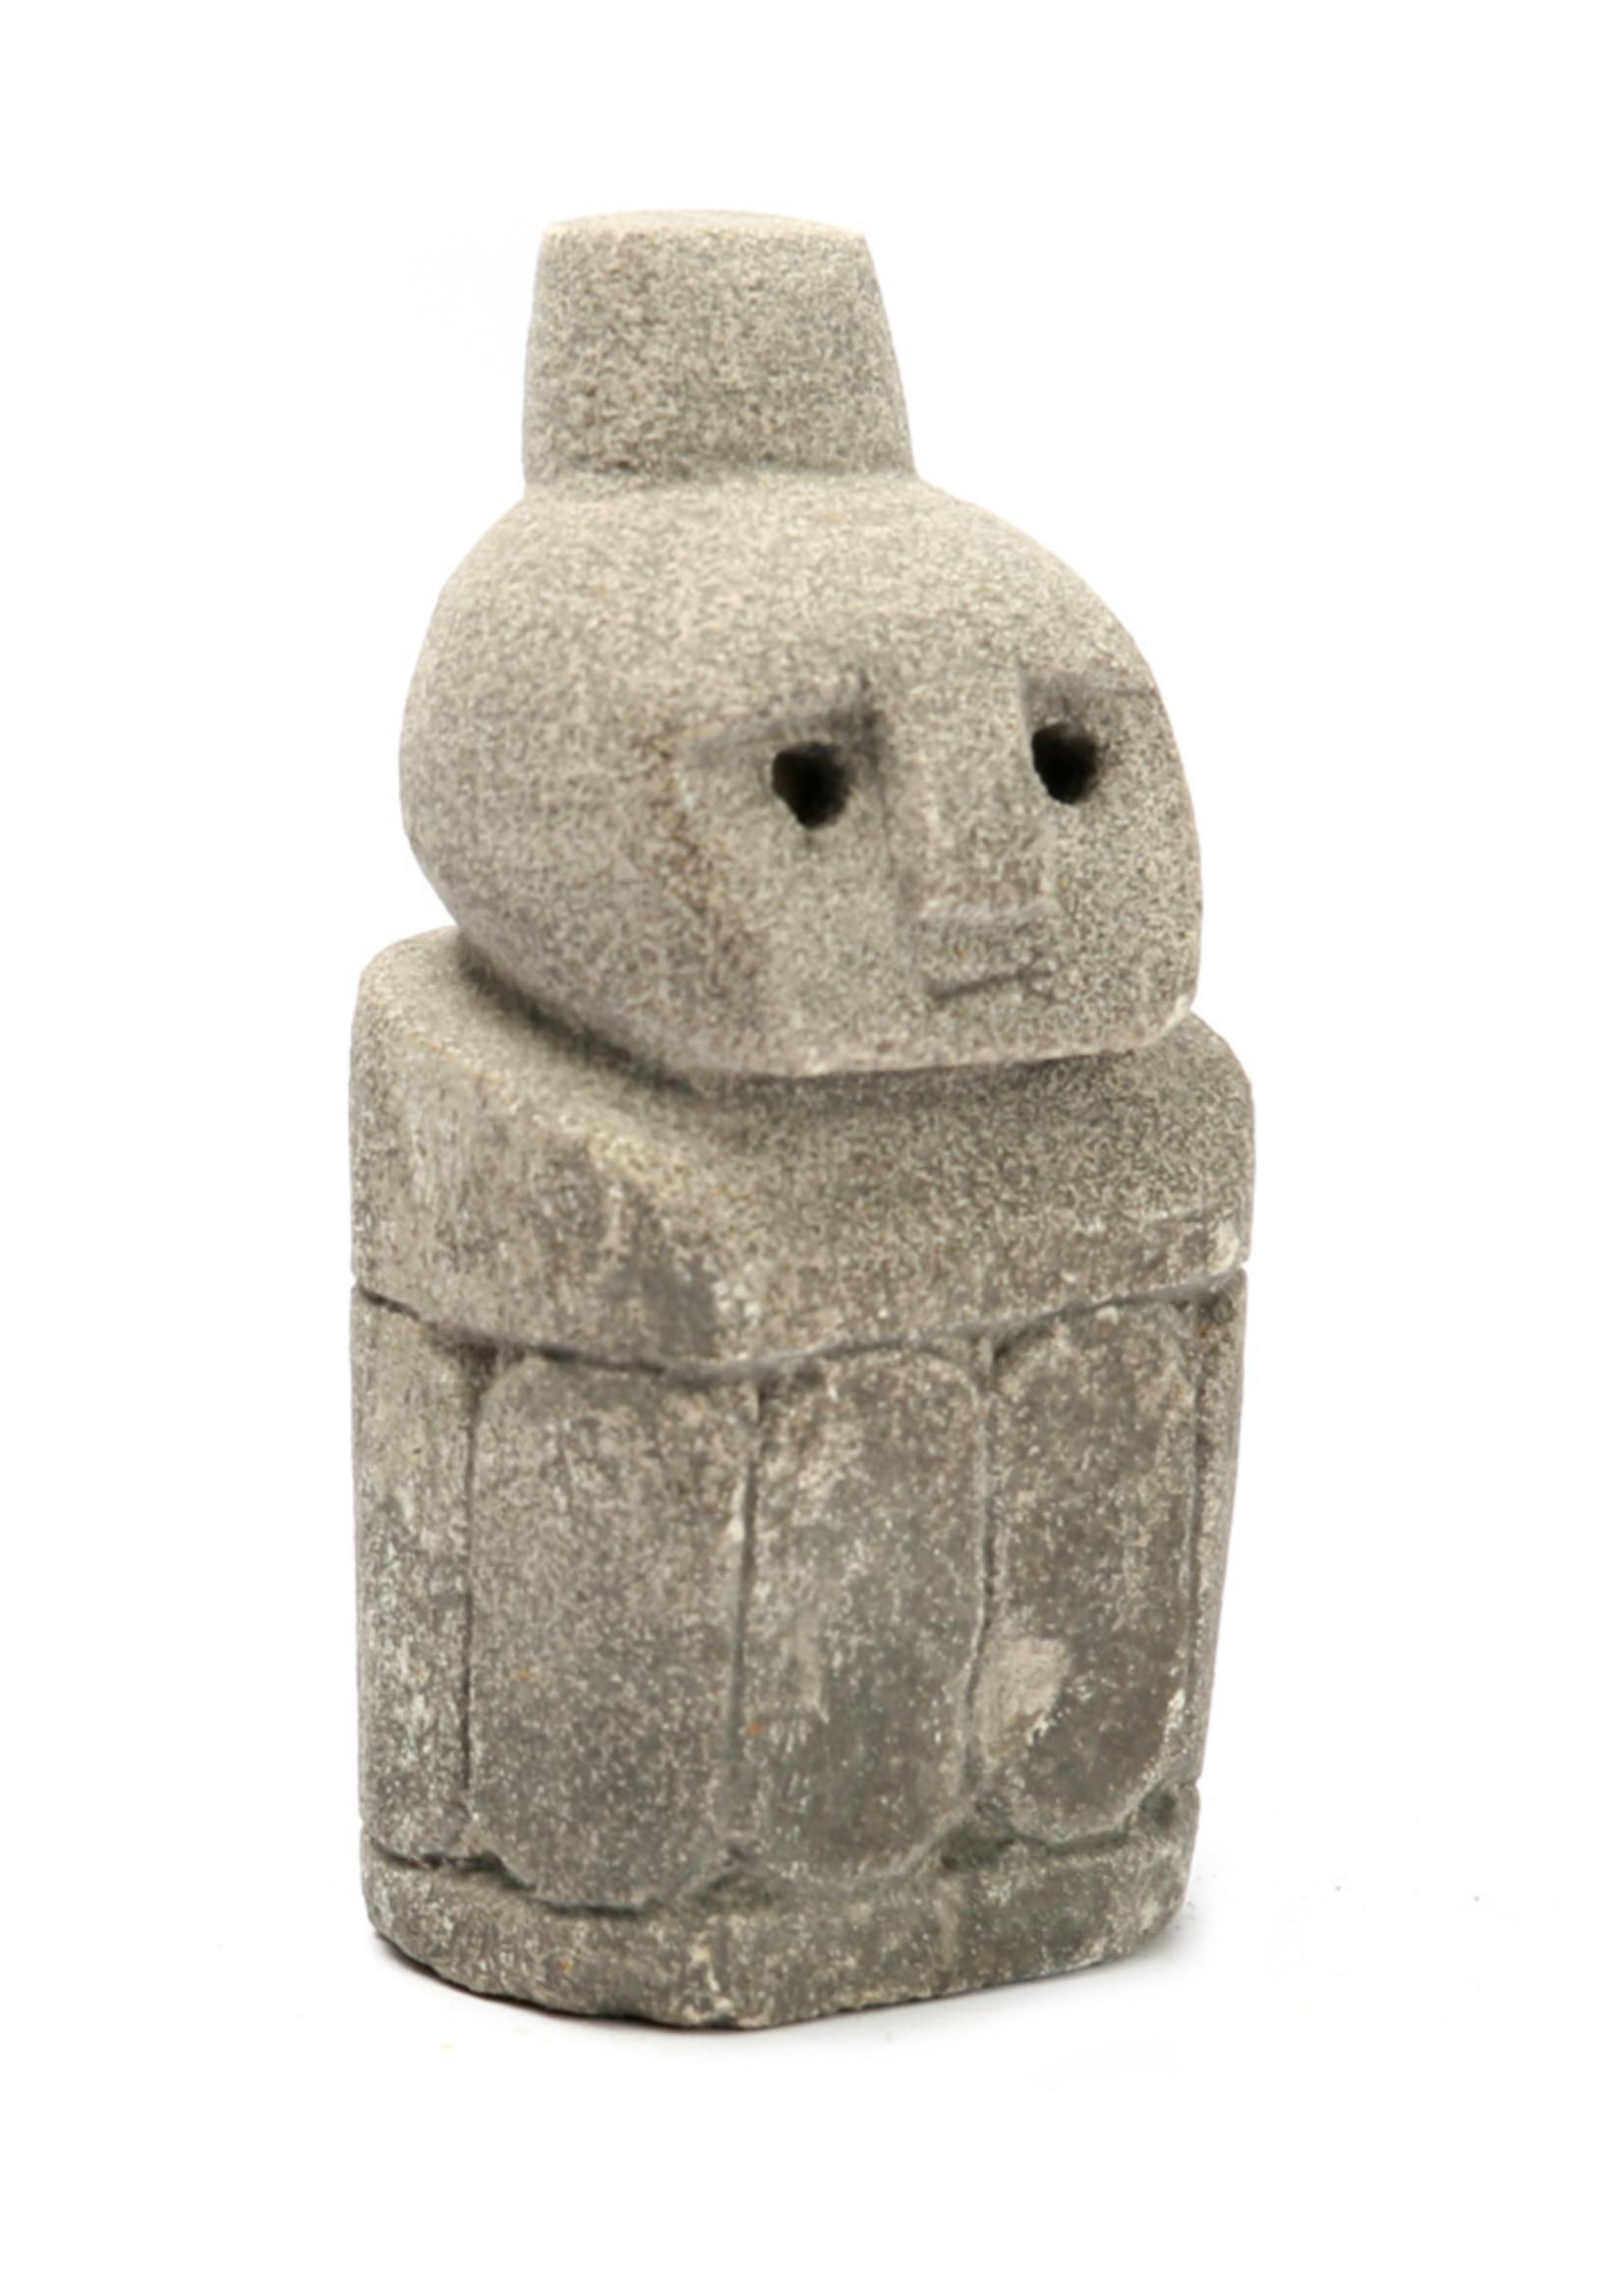 Sumba Stone Statue #07 - Natural